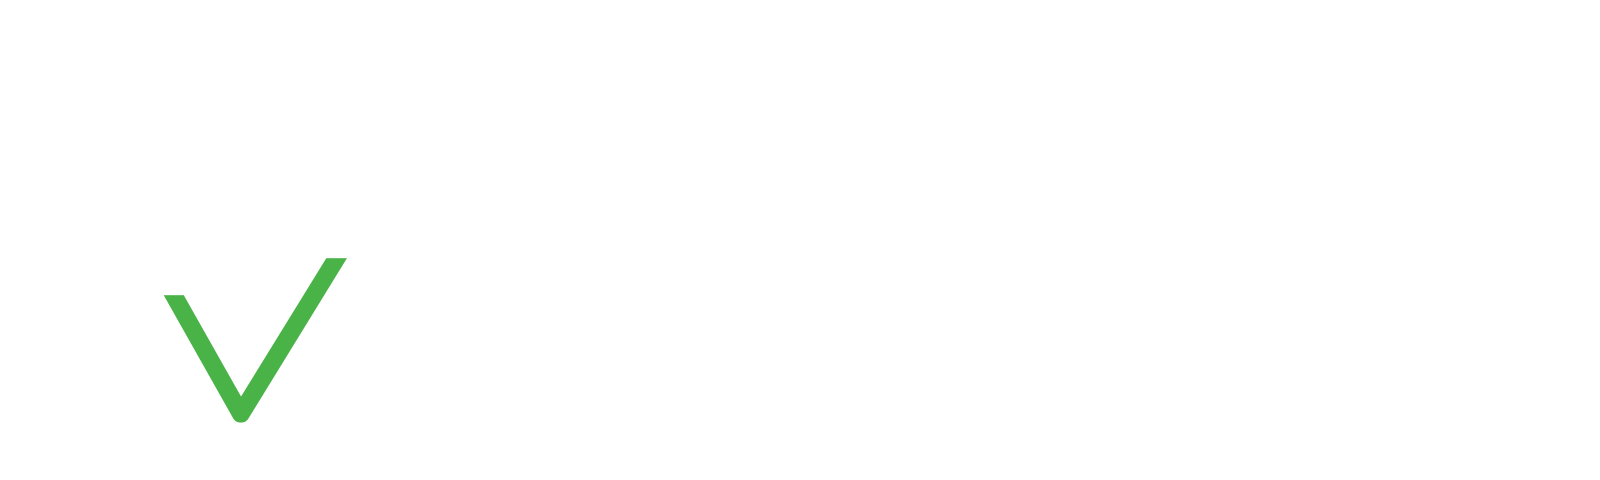 Toolstrek